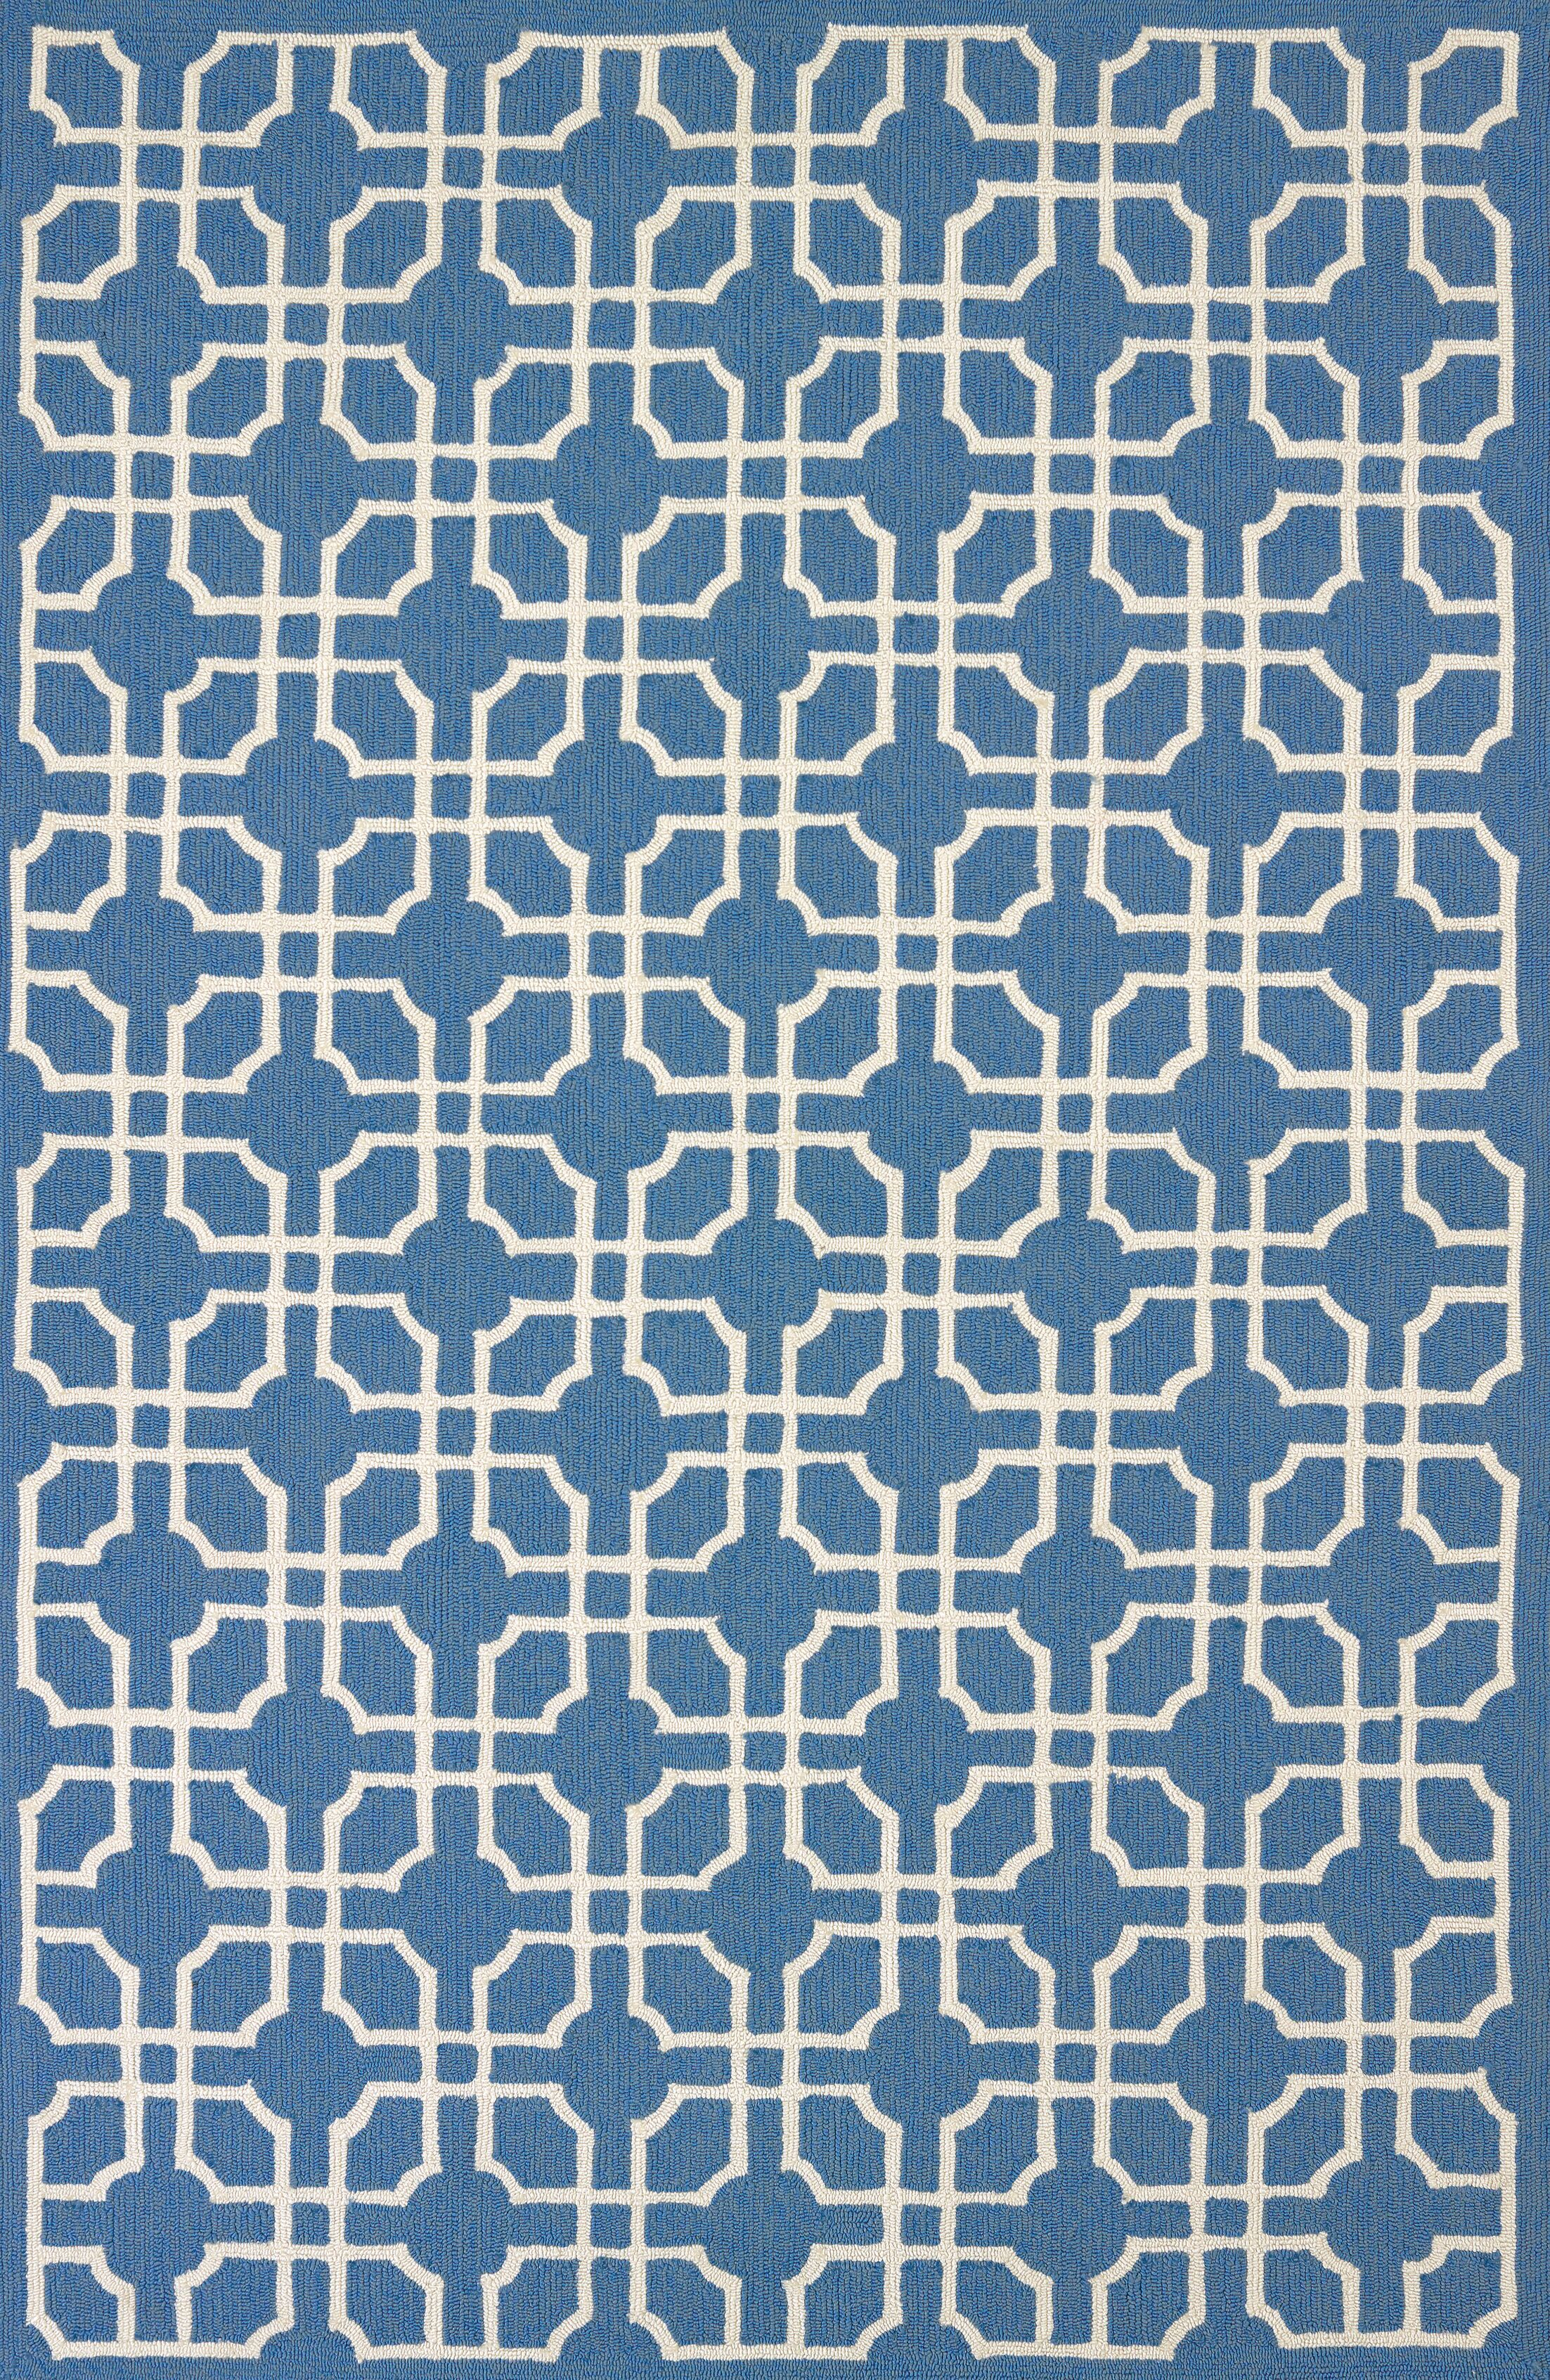 Atrium Handmade Blue Indoor/Outdoor Area Rug Rug Size: 5' x 7'6